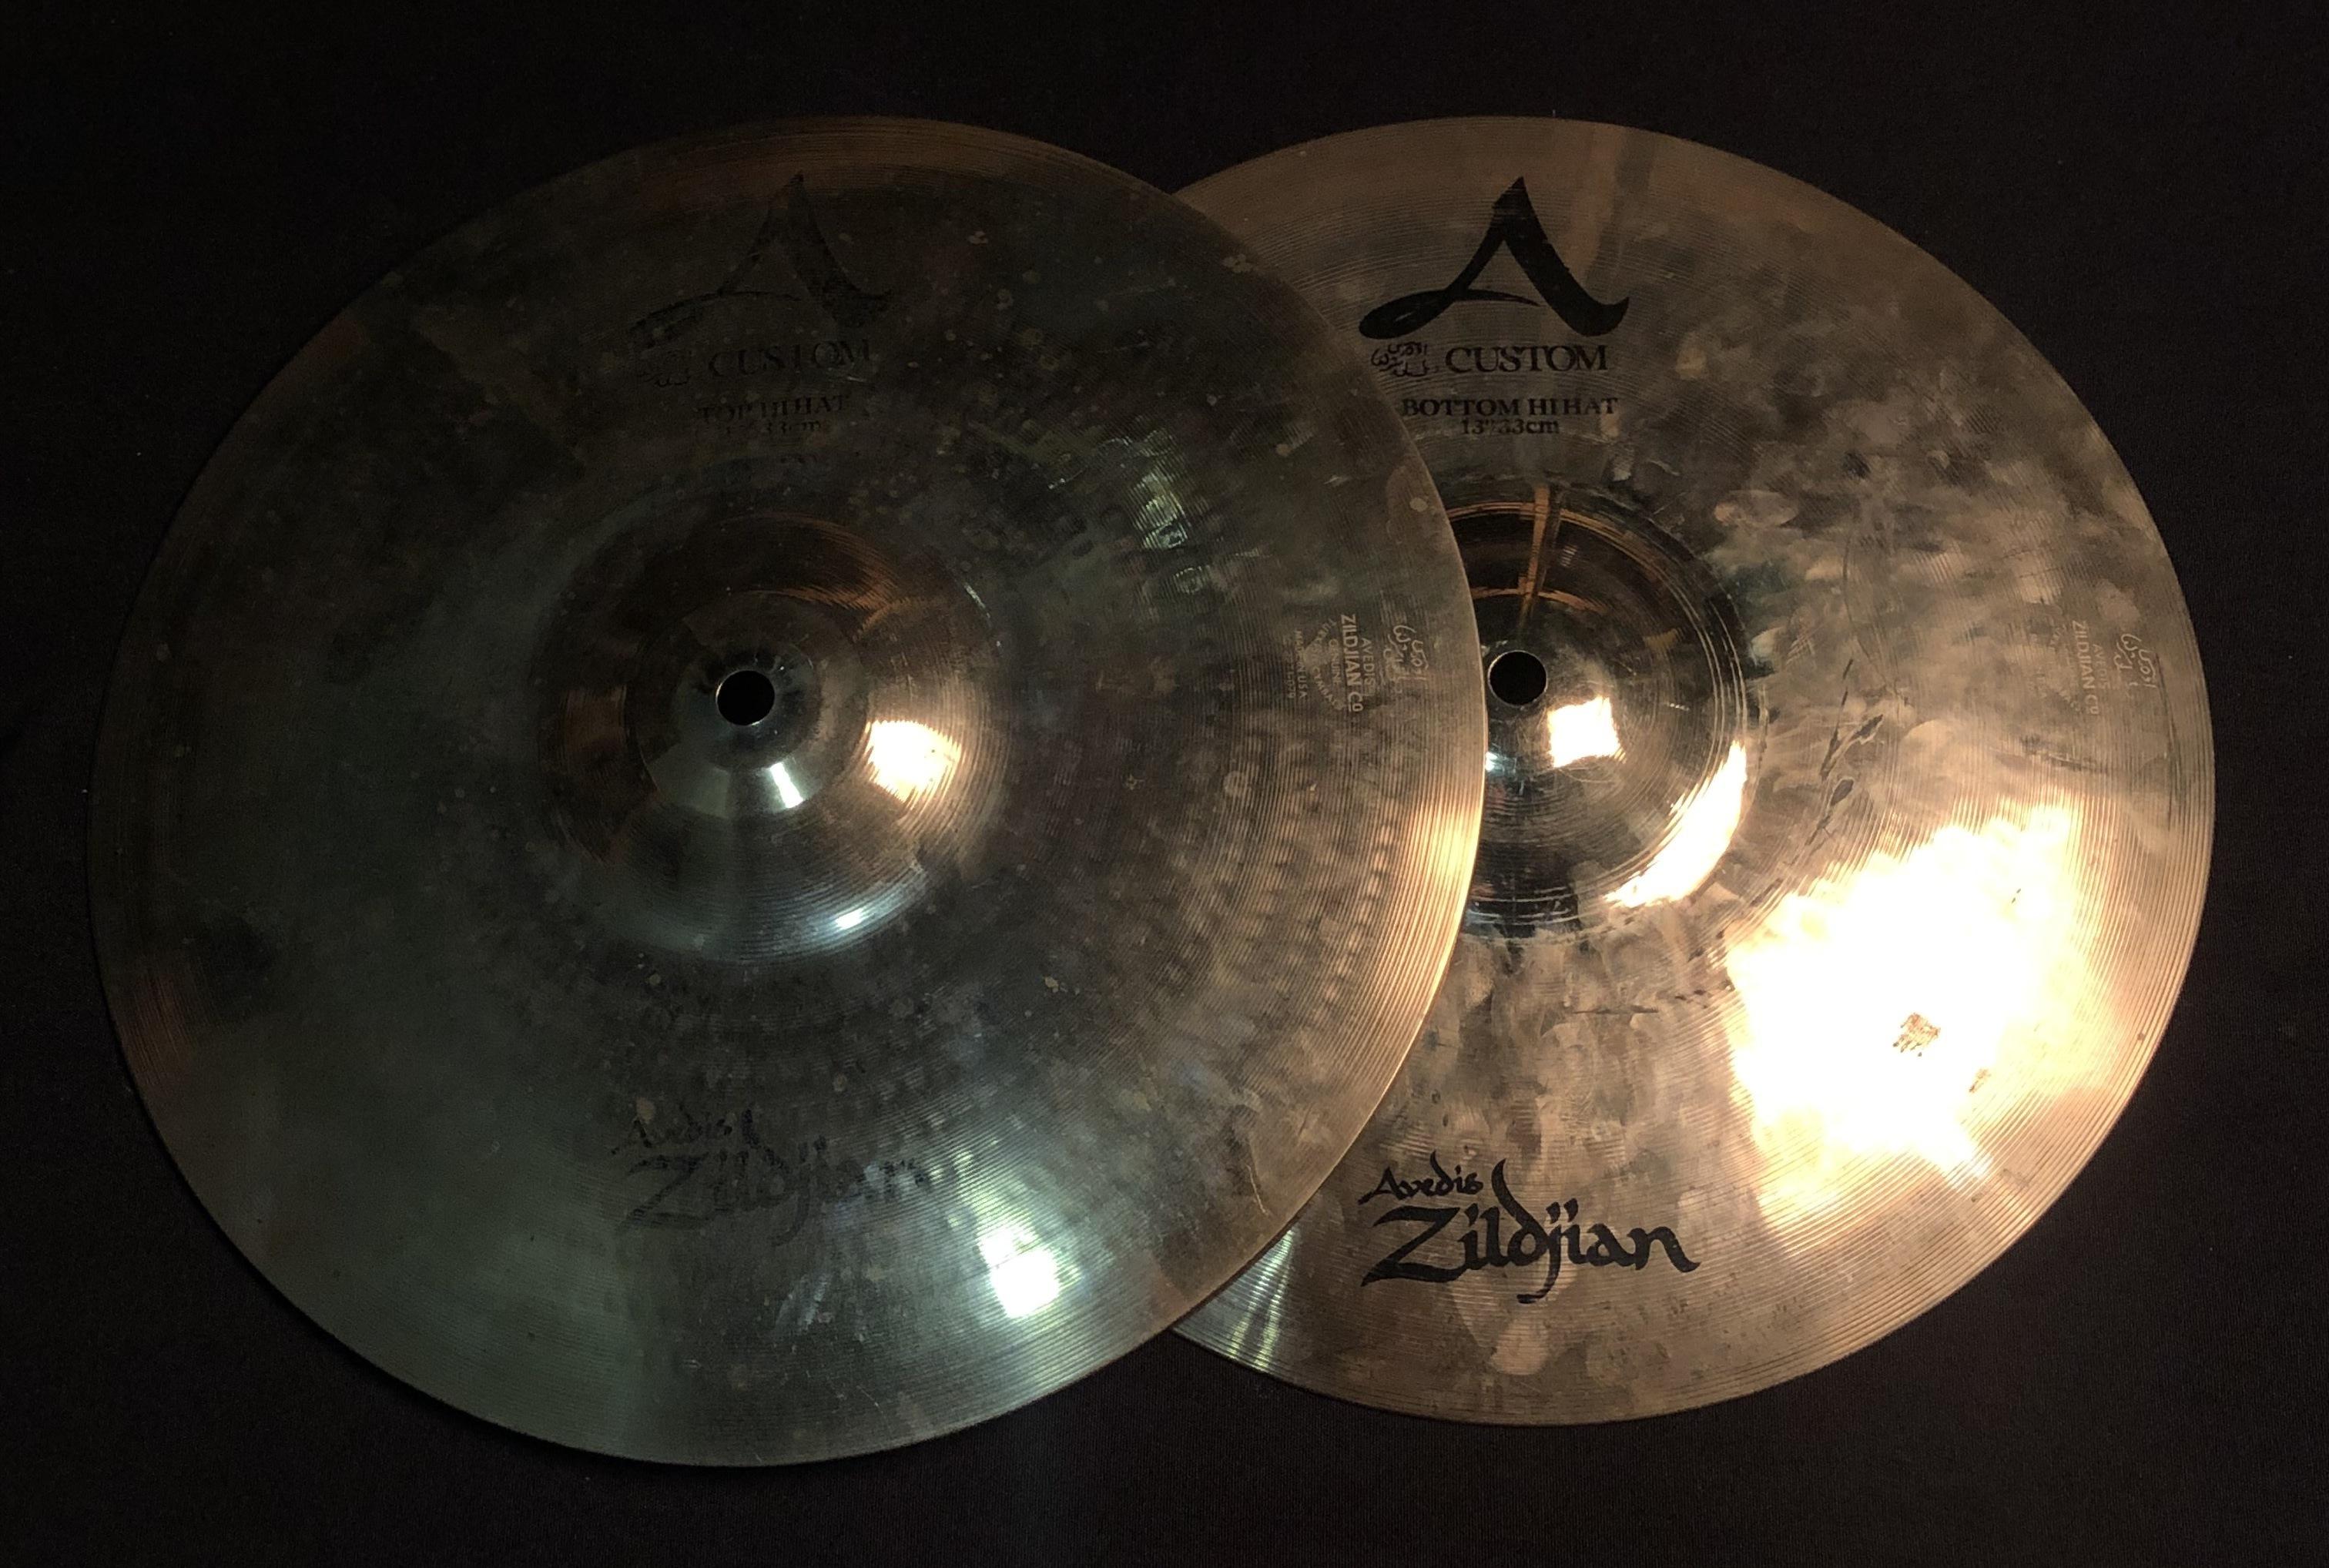 ZILDJIAN - A Custom Hi-Hats 13